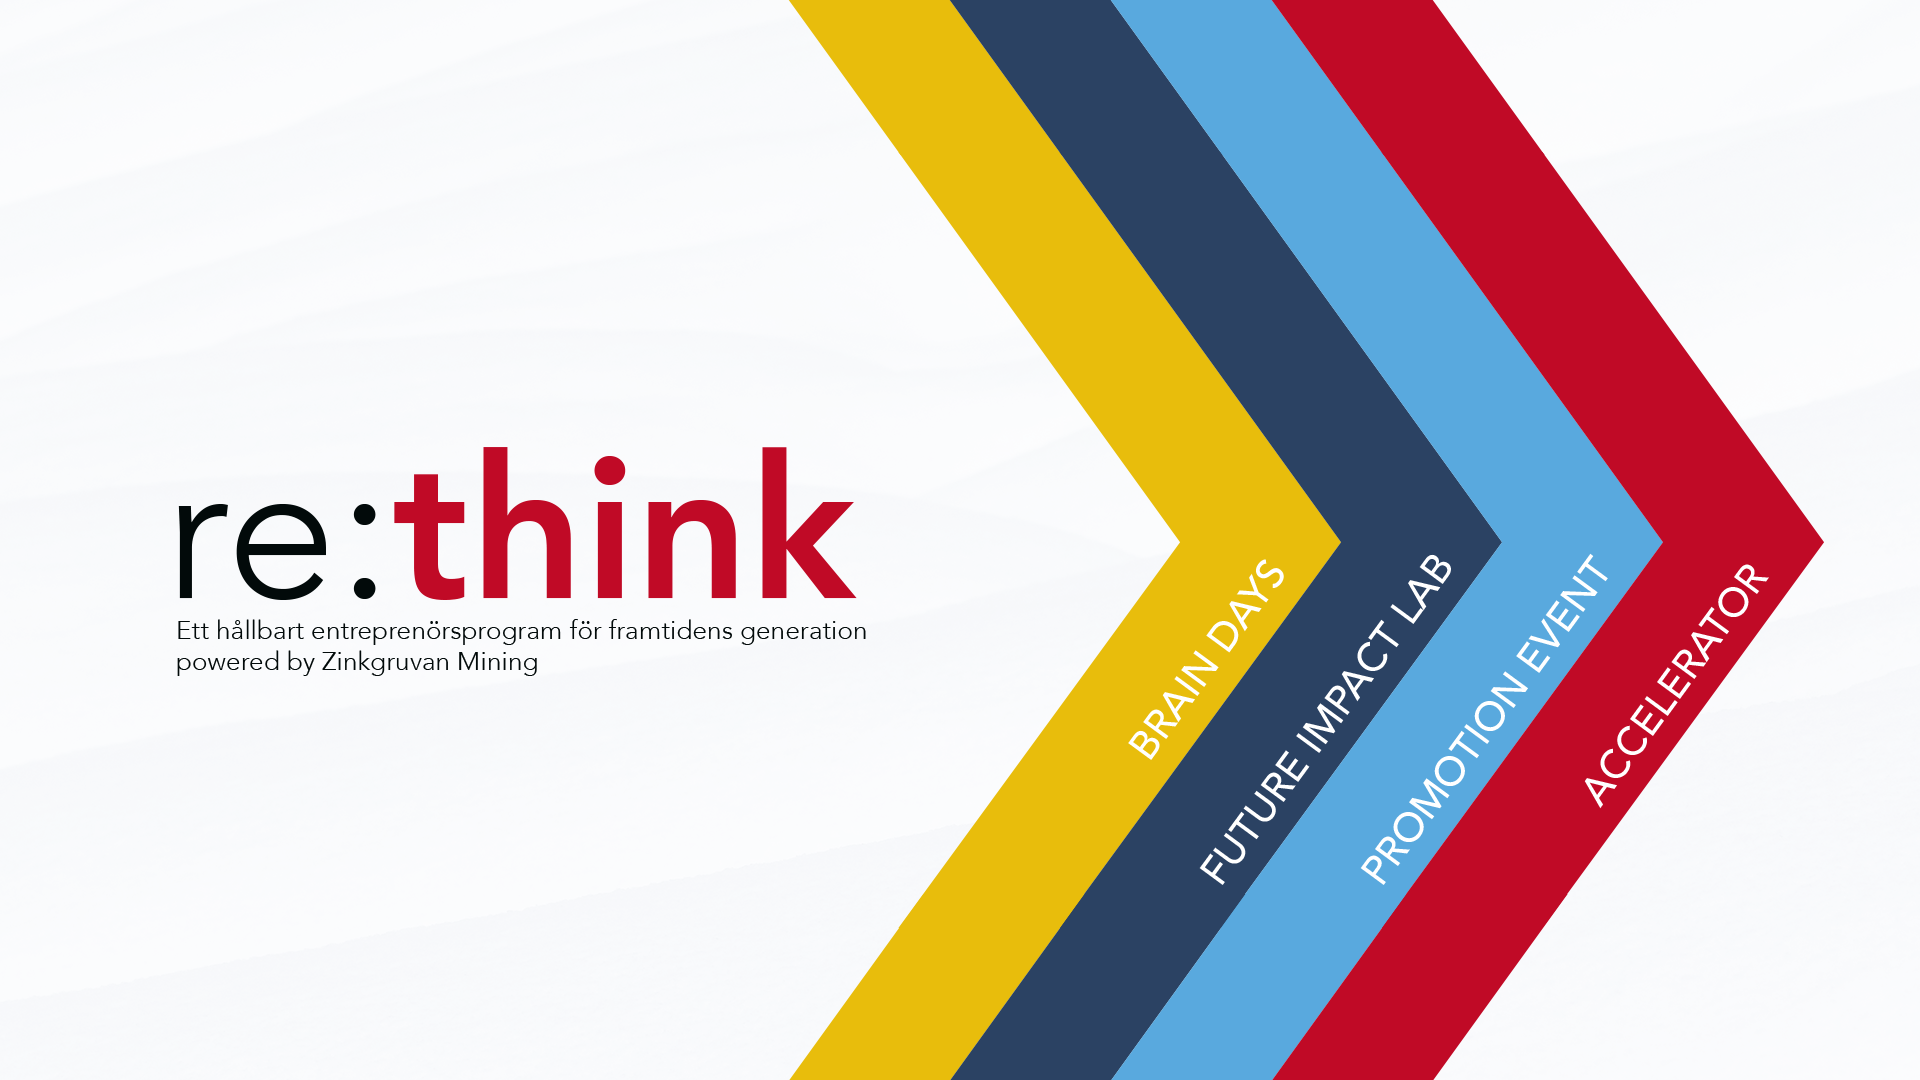 rethink-hemsida-banner2